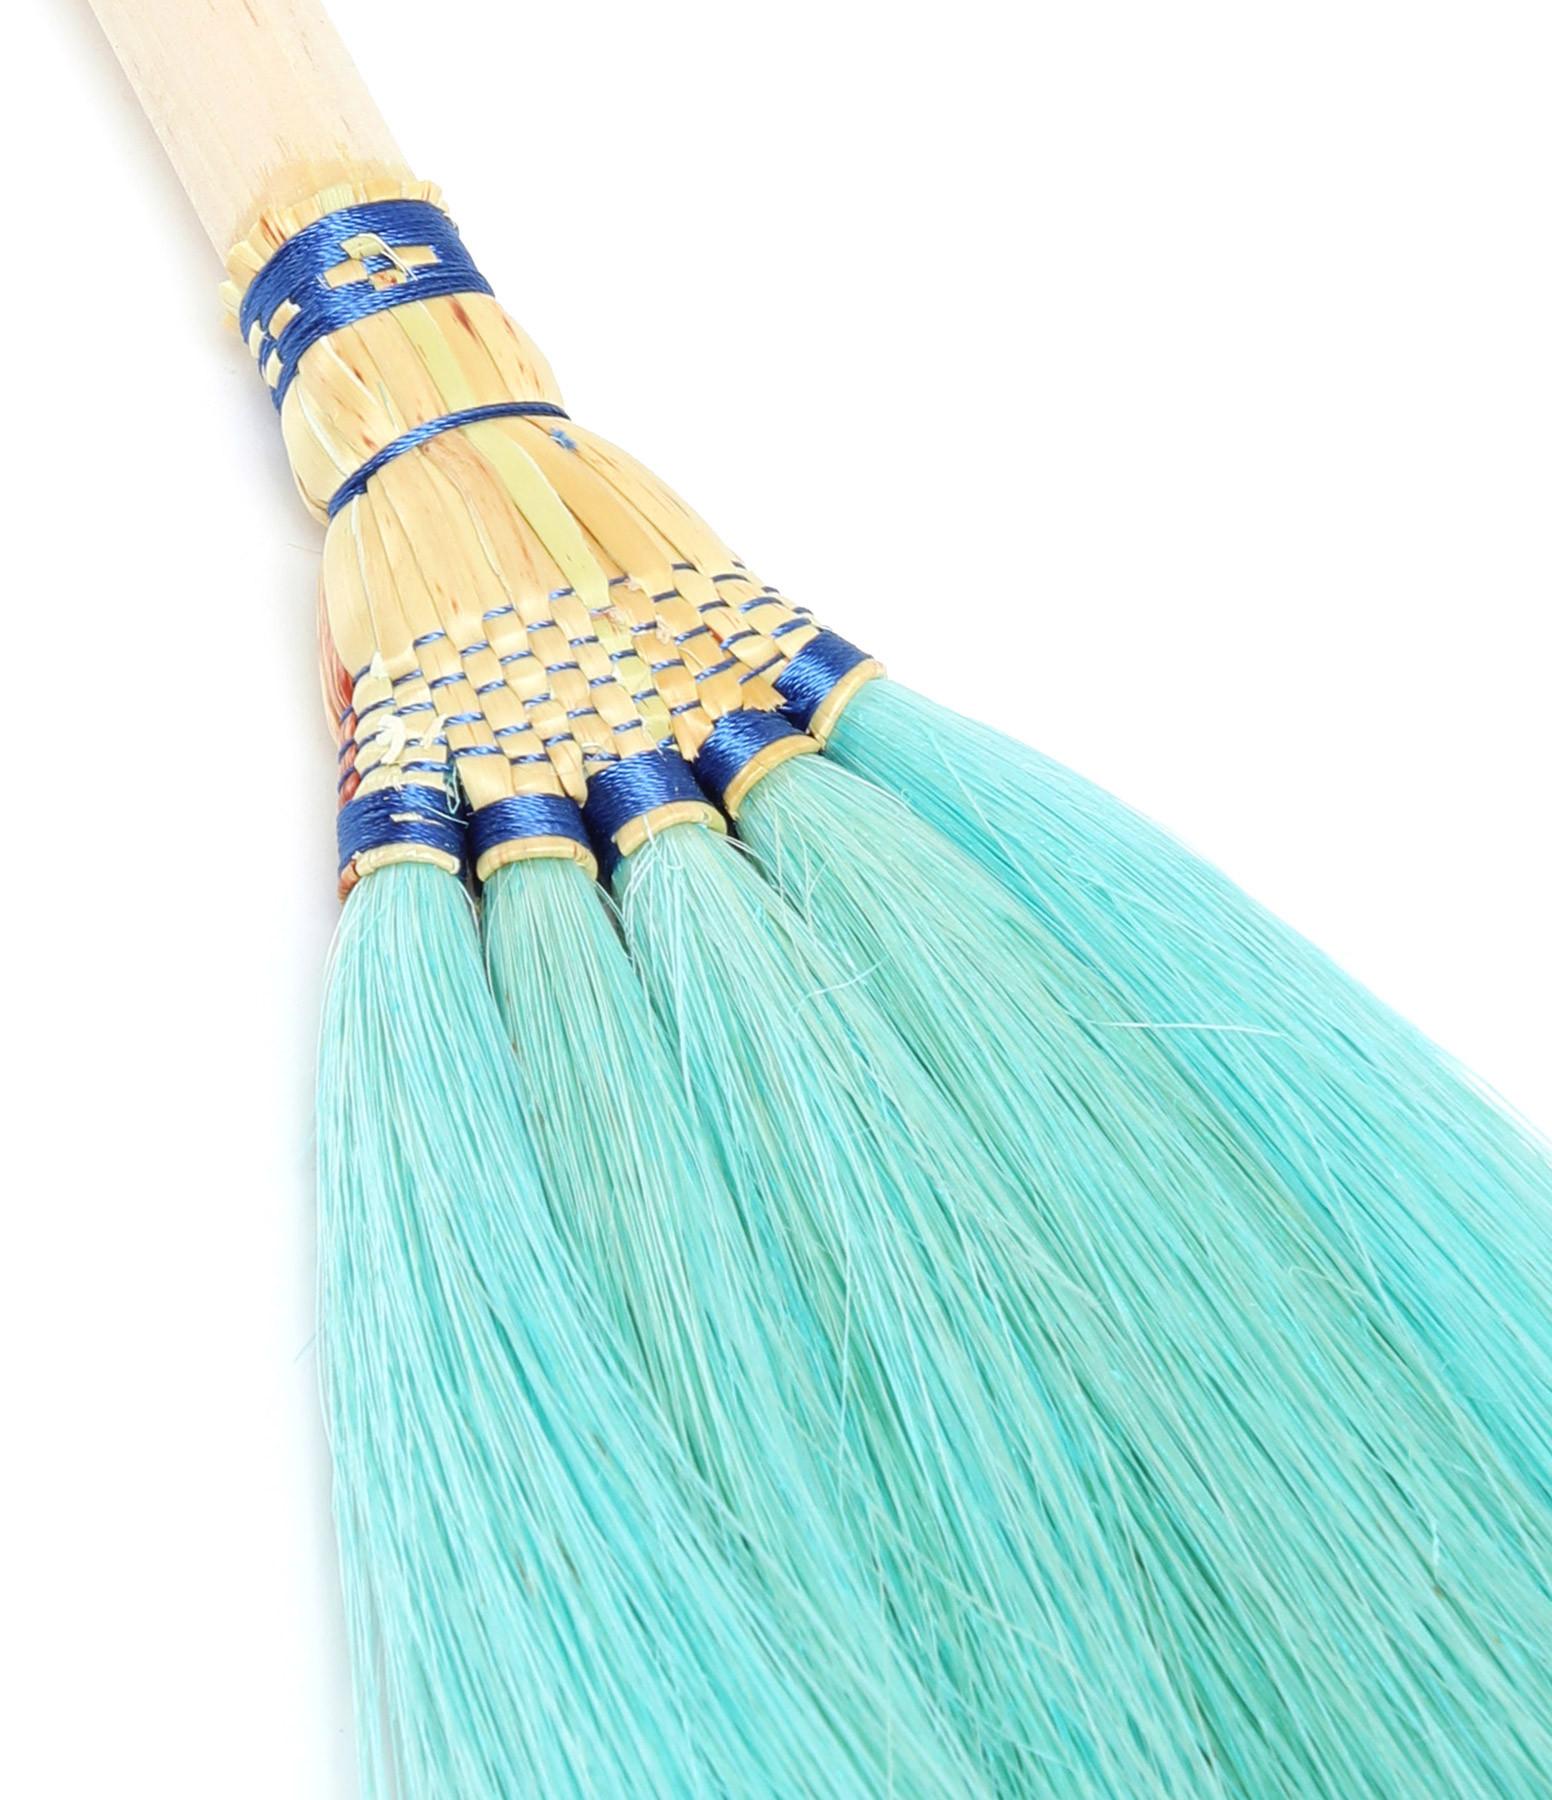 TIKY - Plumeau de Plage Tiky Turquoise